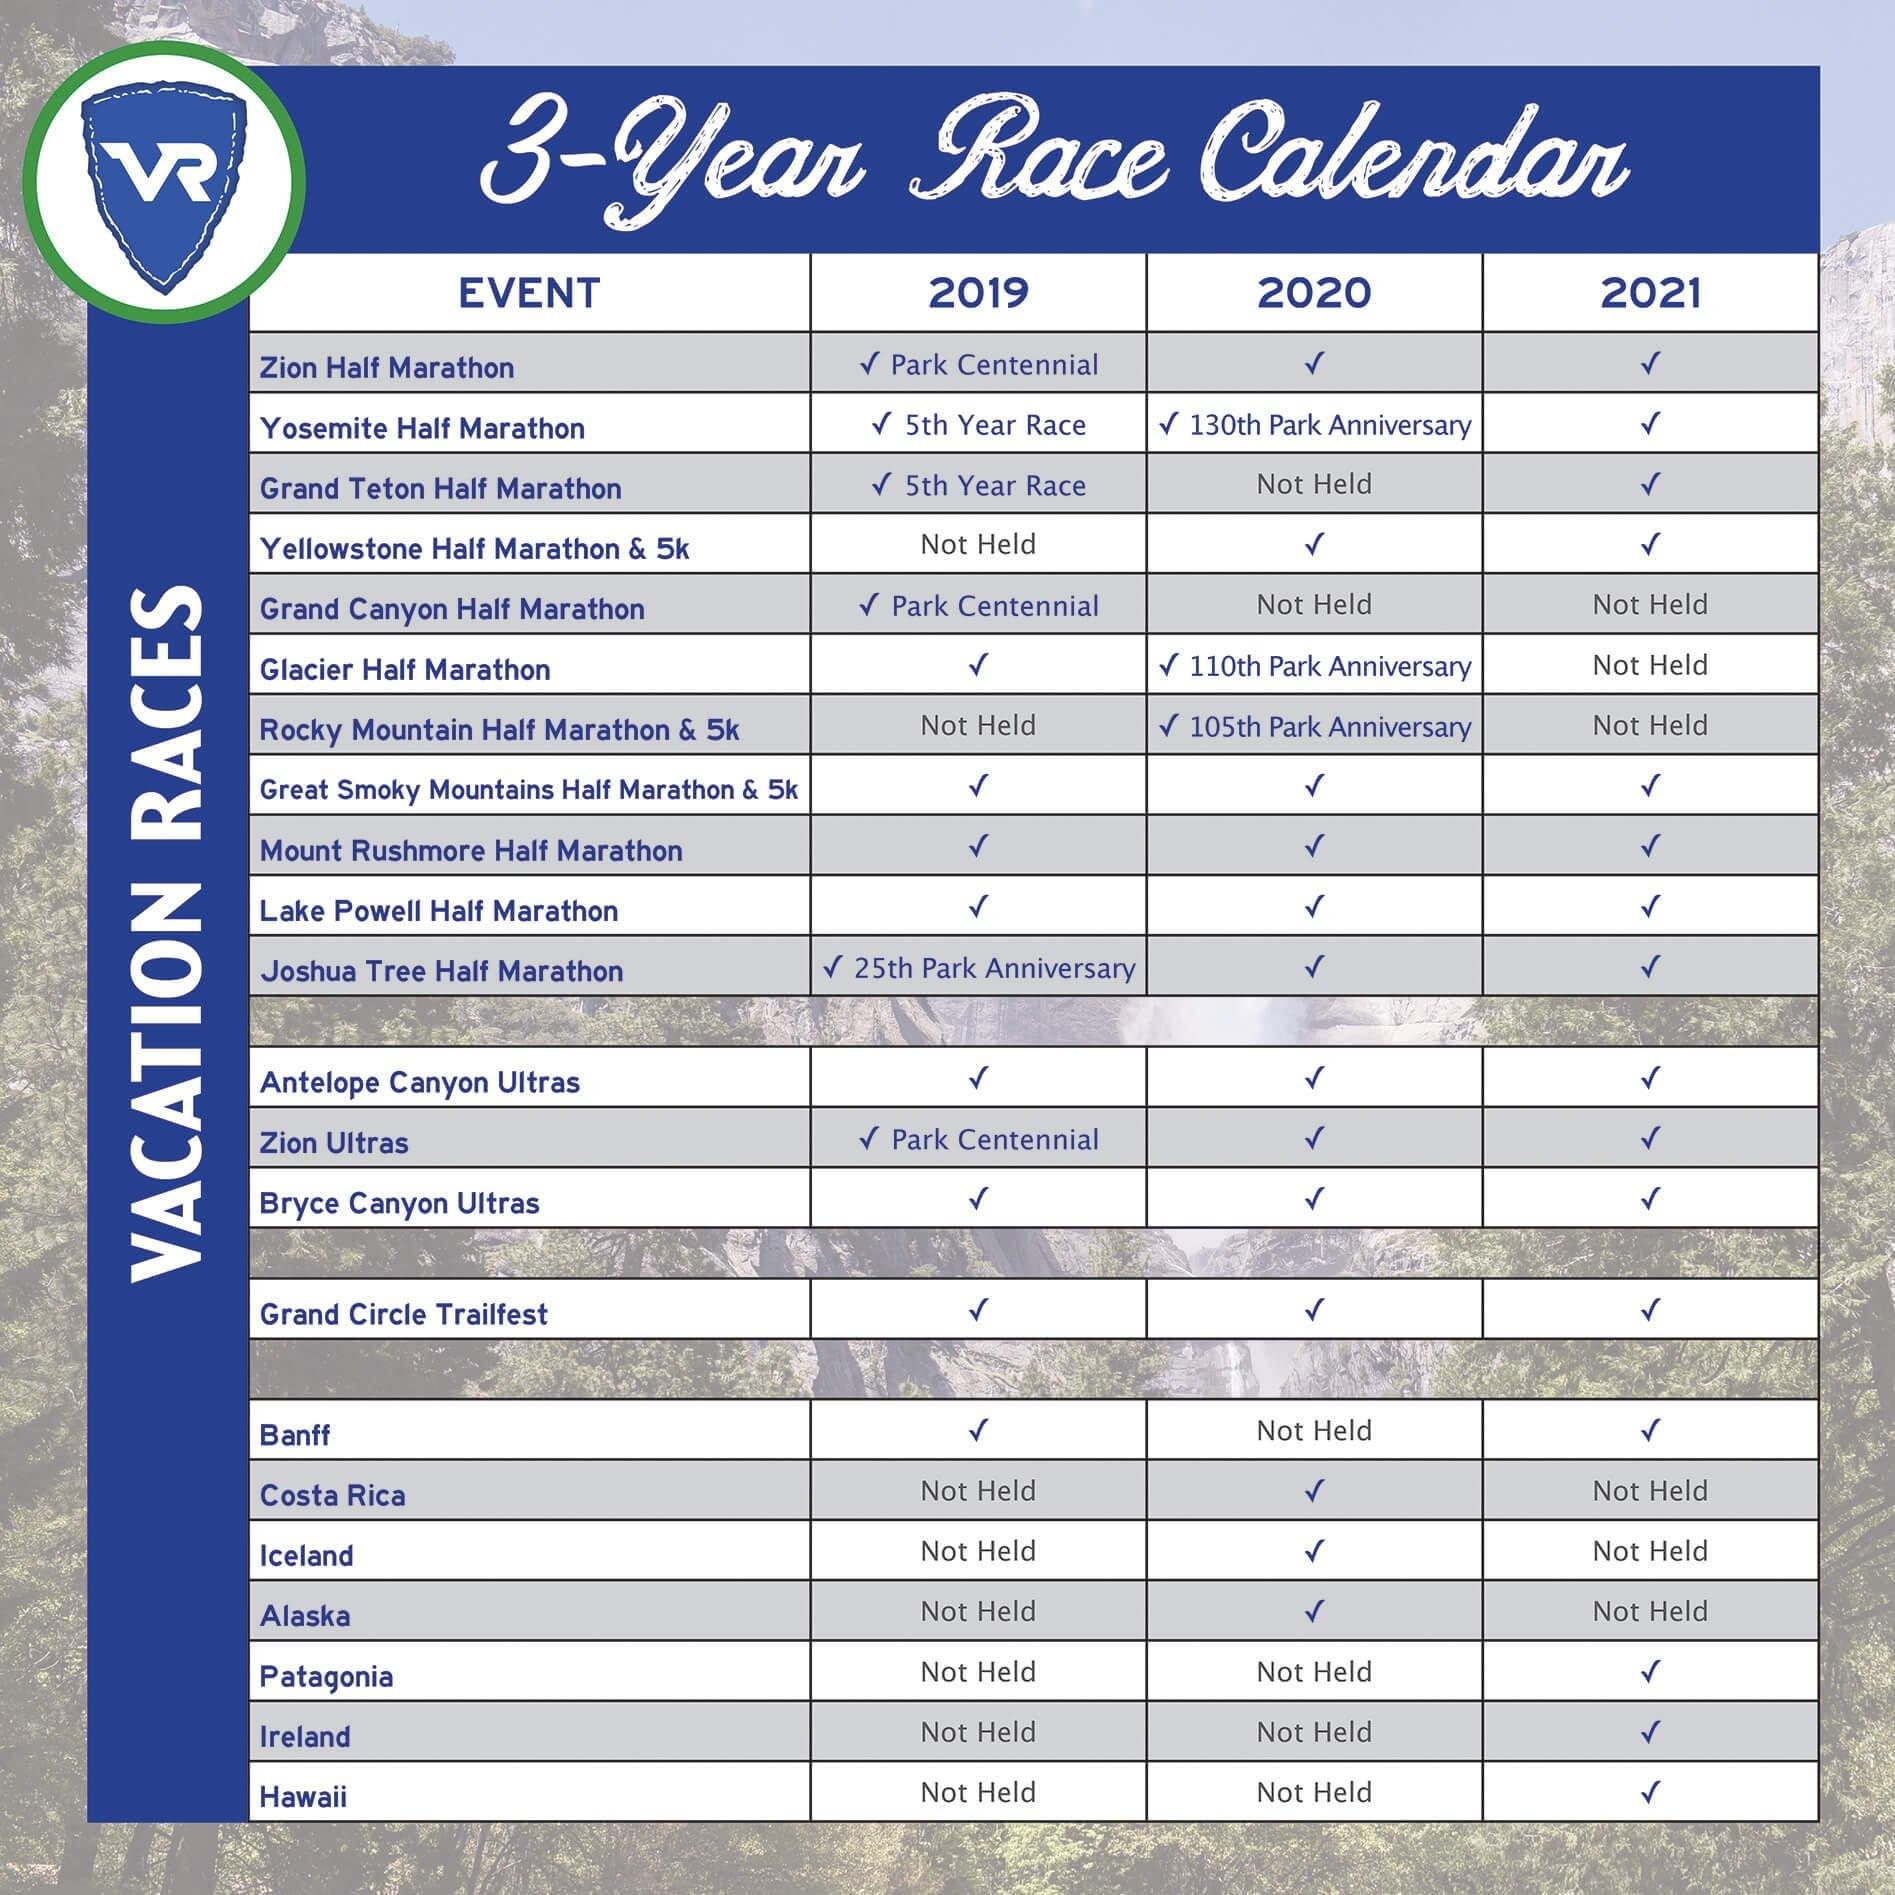 3-Year Race Calendar, Schedule Rotation, And Race Logo Previews 3 Corps Calendar 2019